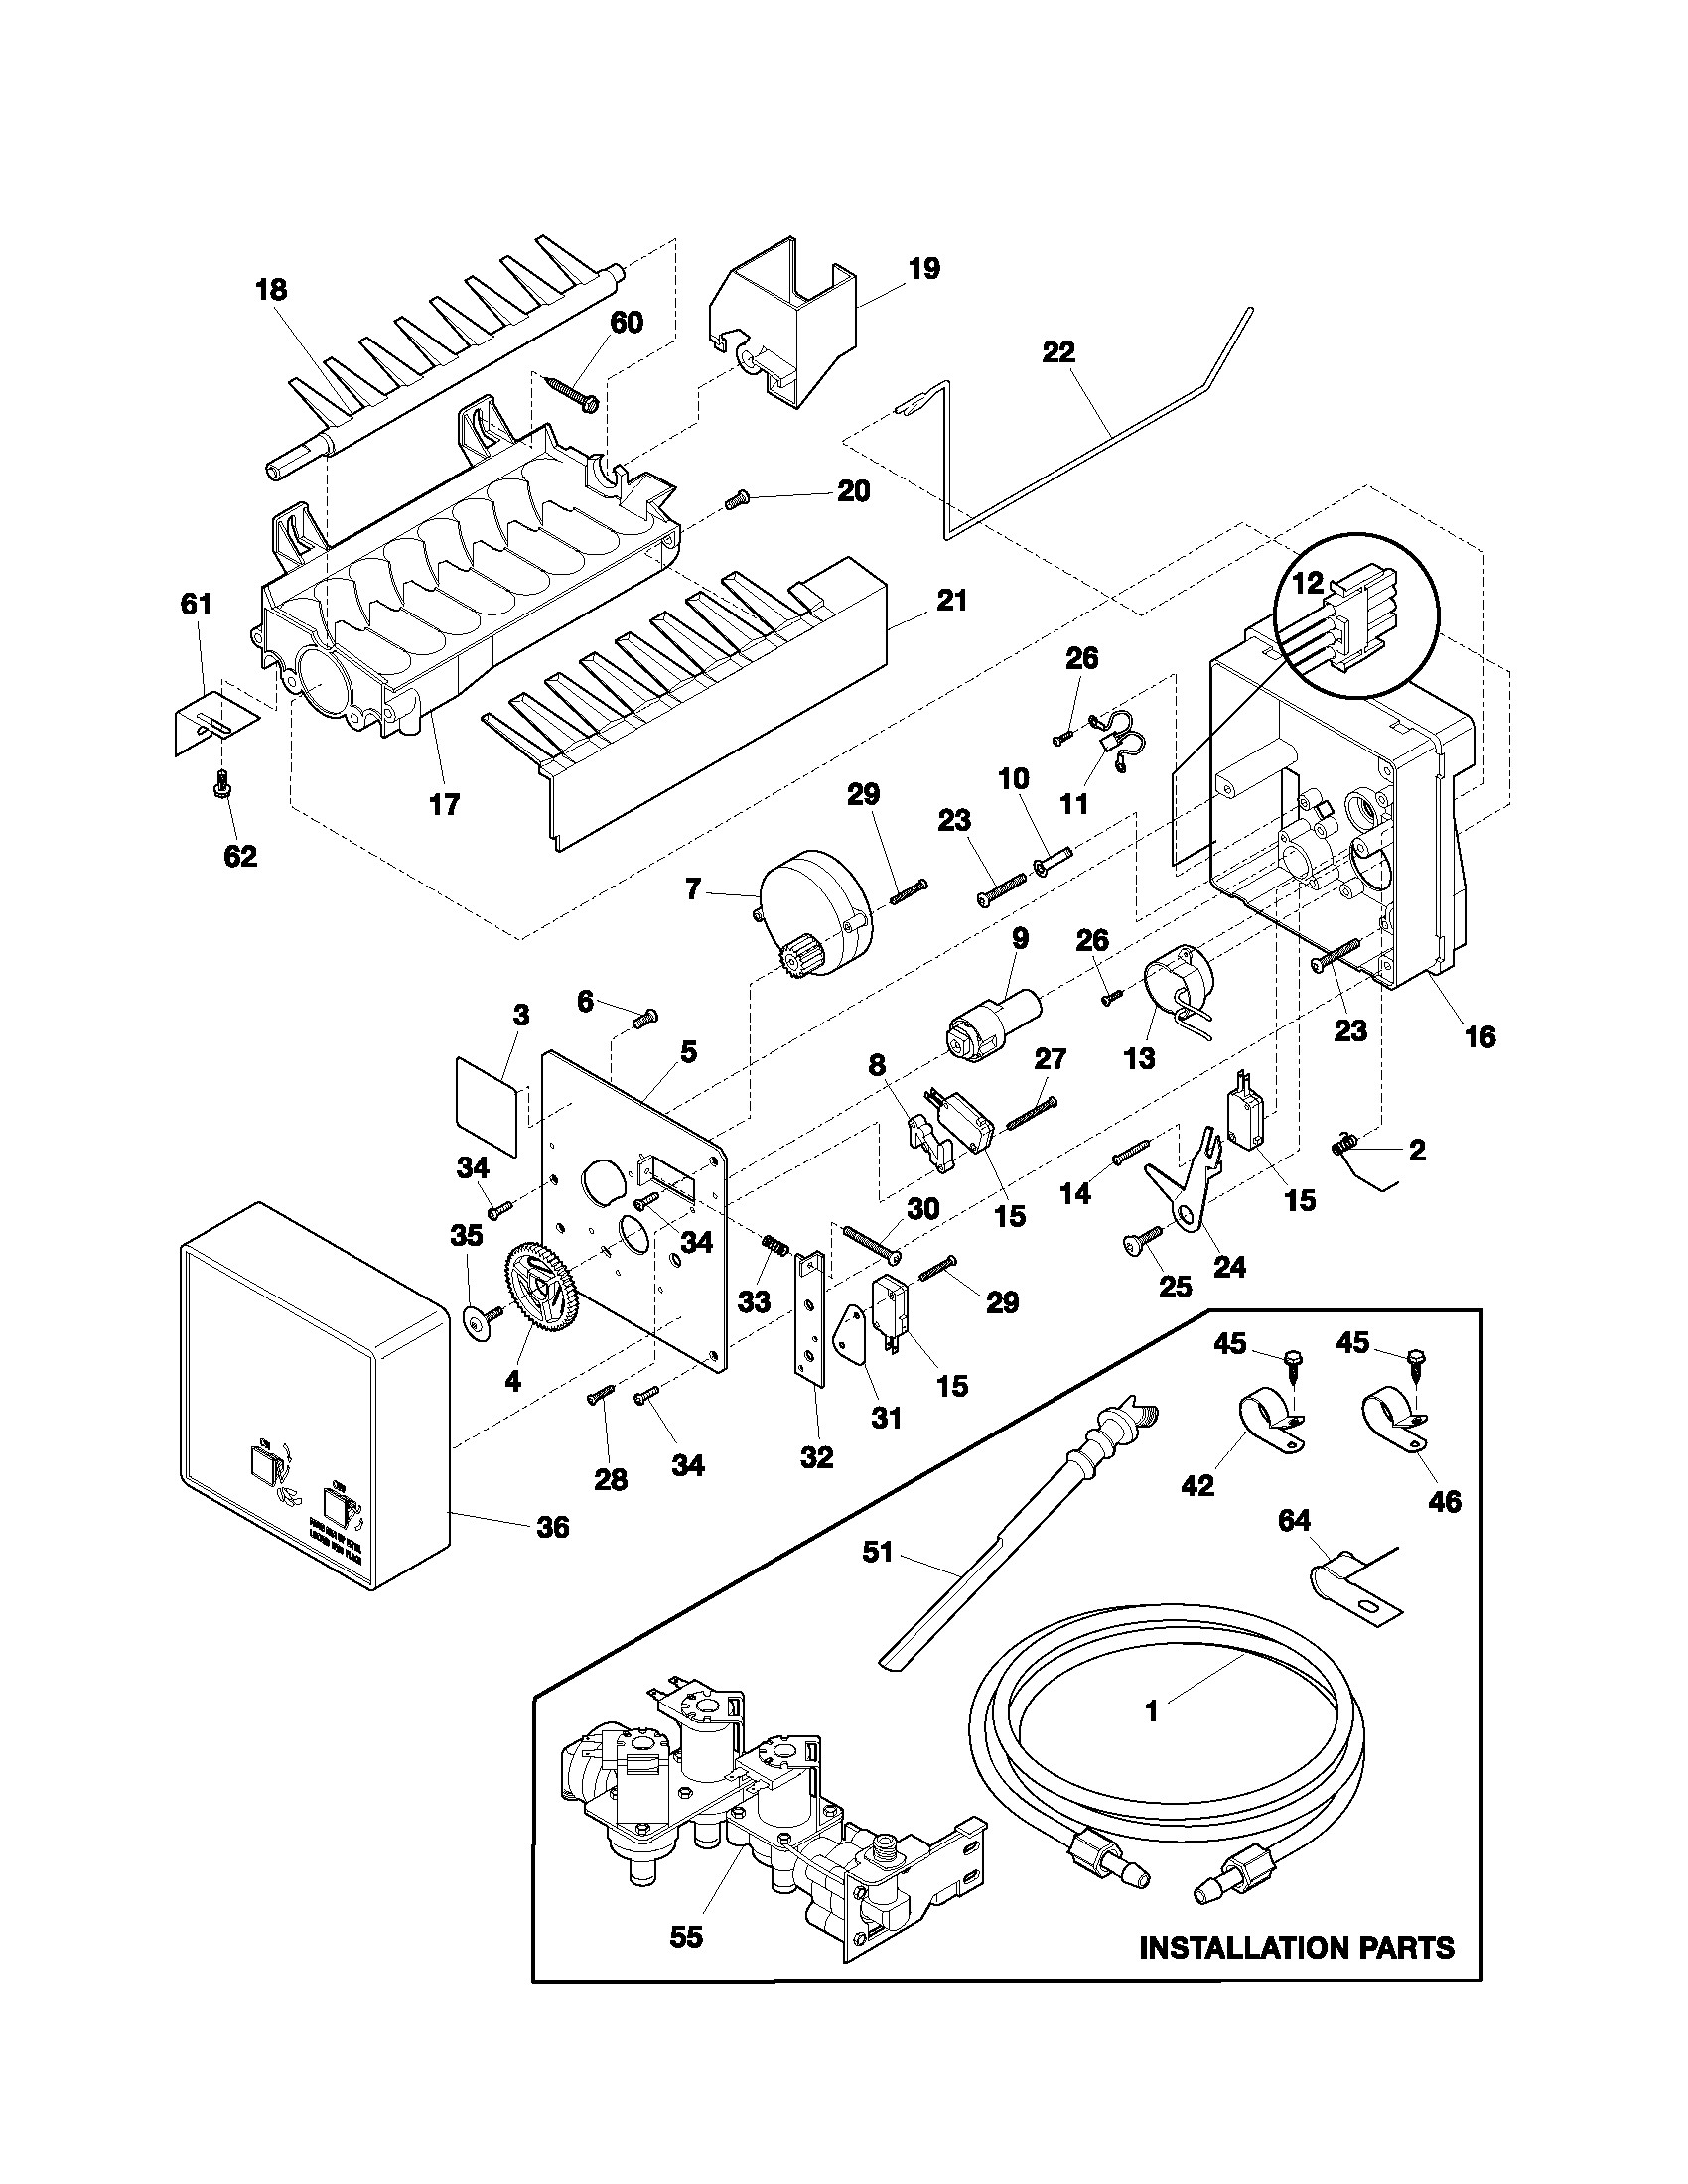 Frigidaire Gallery Dishwasher Parts Diagram Frigidaire Refrigerator Parts Model Frs26kr4cq1